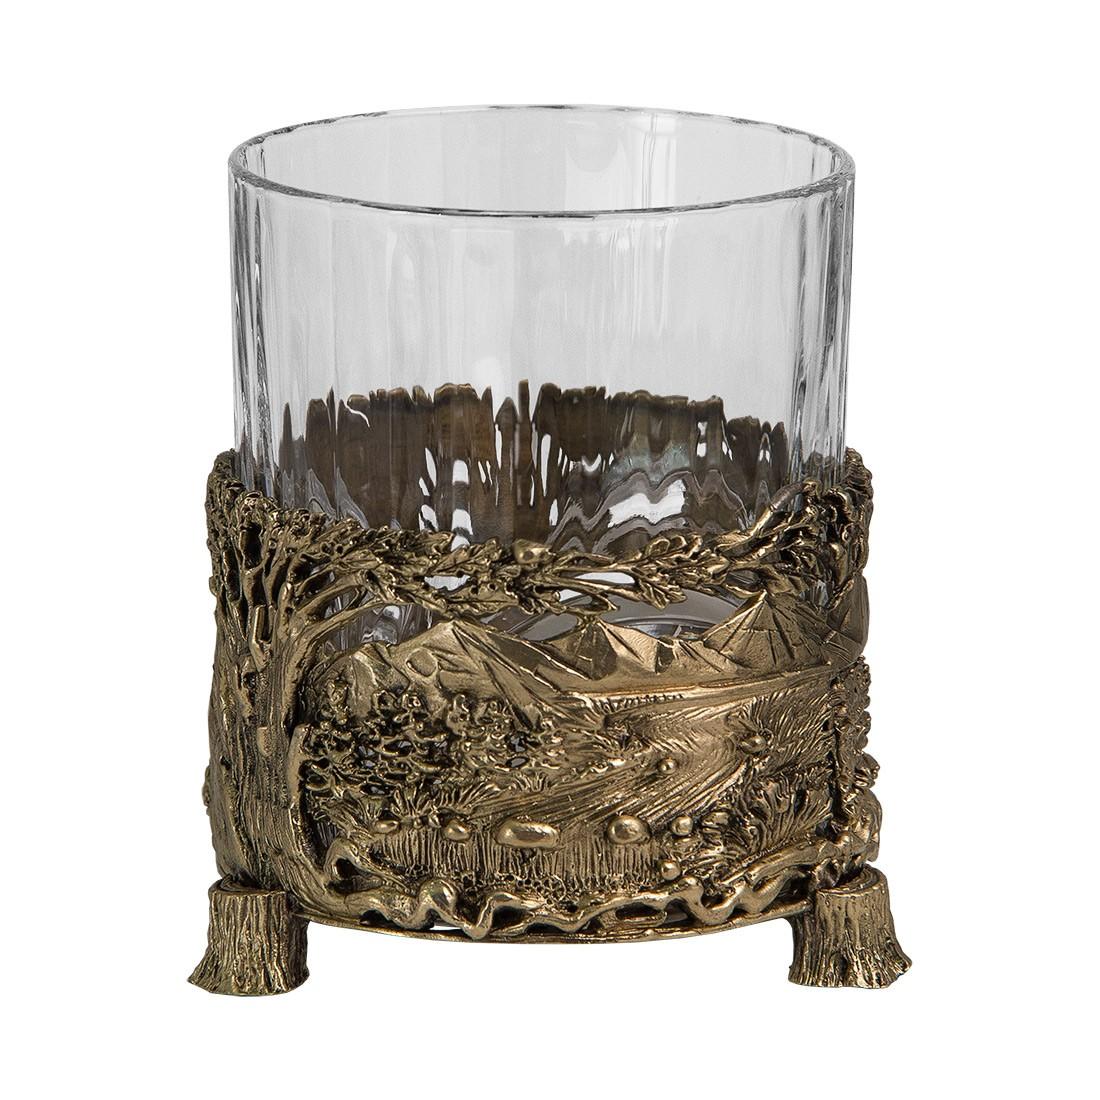 Бокал для виски «Медведь» с камнями в деревянном футляре